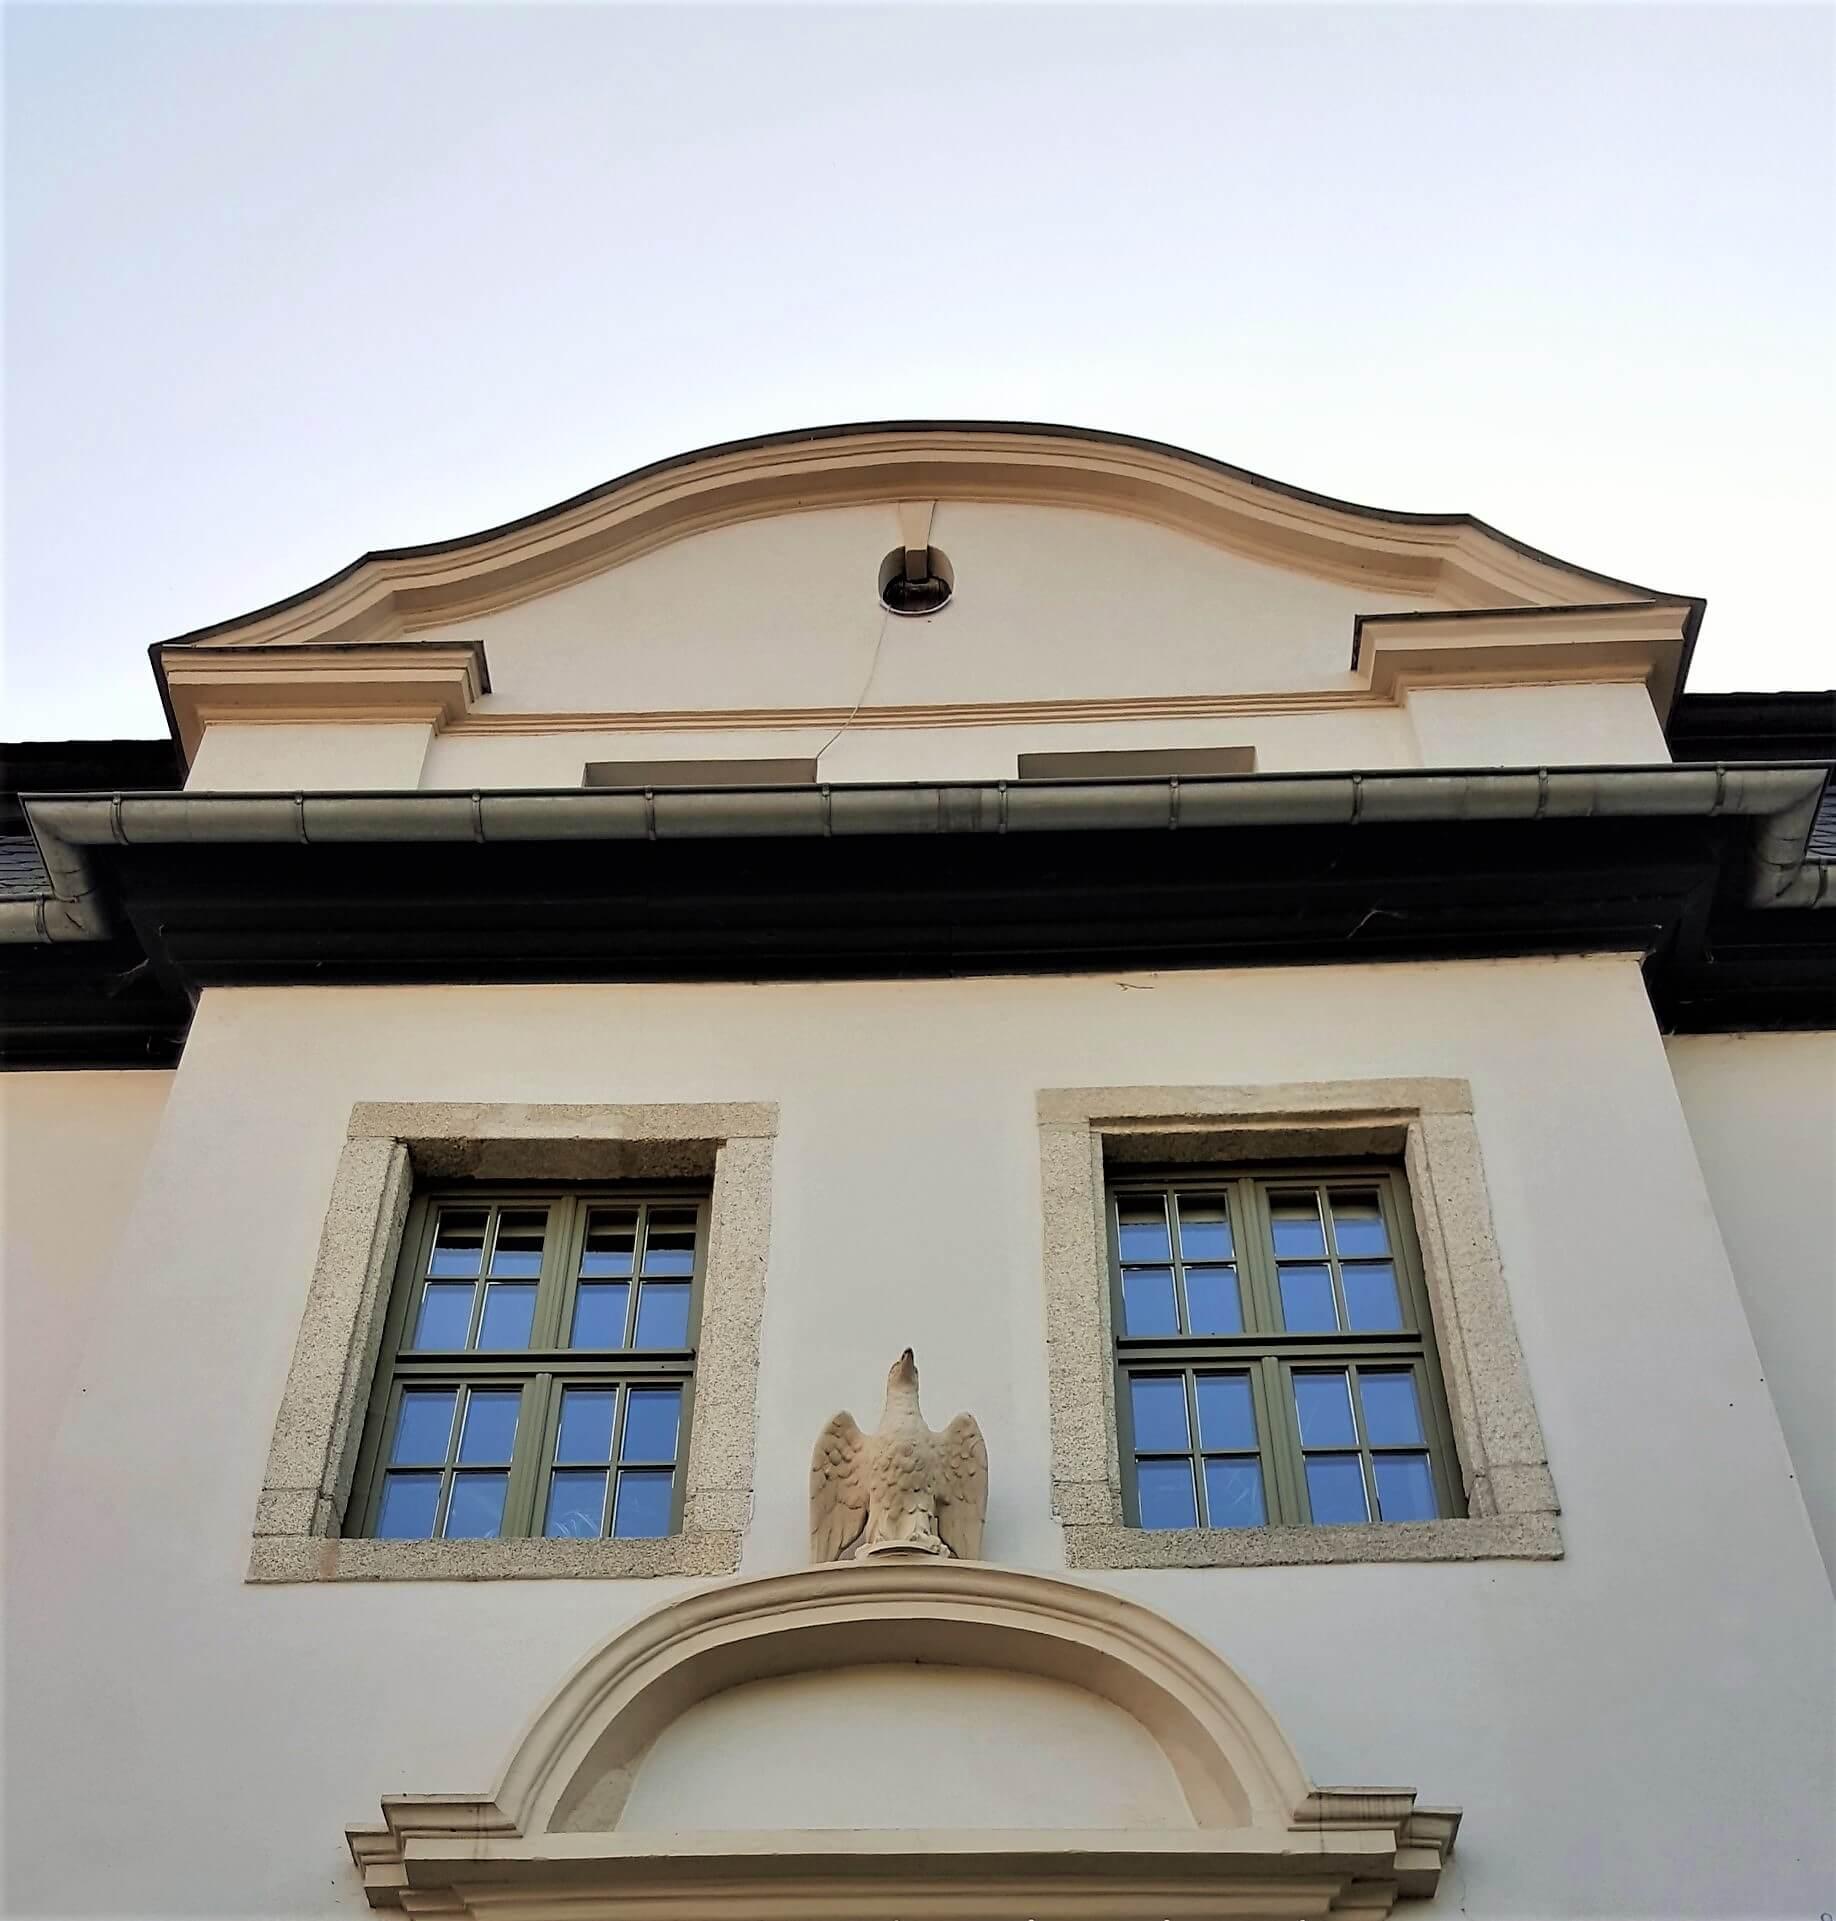 Rittergut Adlershof zu Oberlauterbach - Adler Eingang Herrenhaus © Jens Reiher